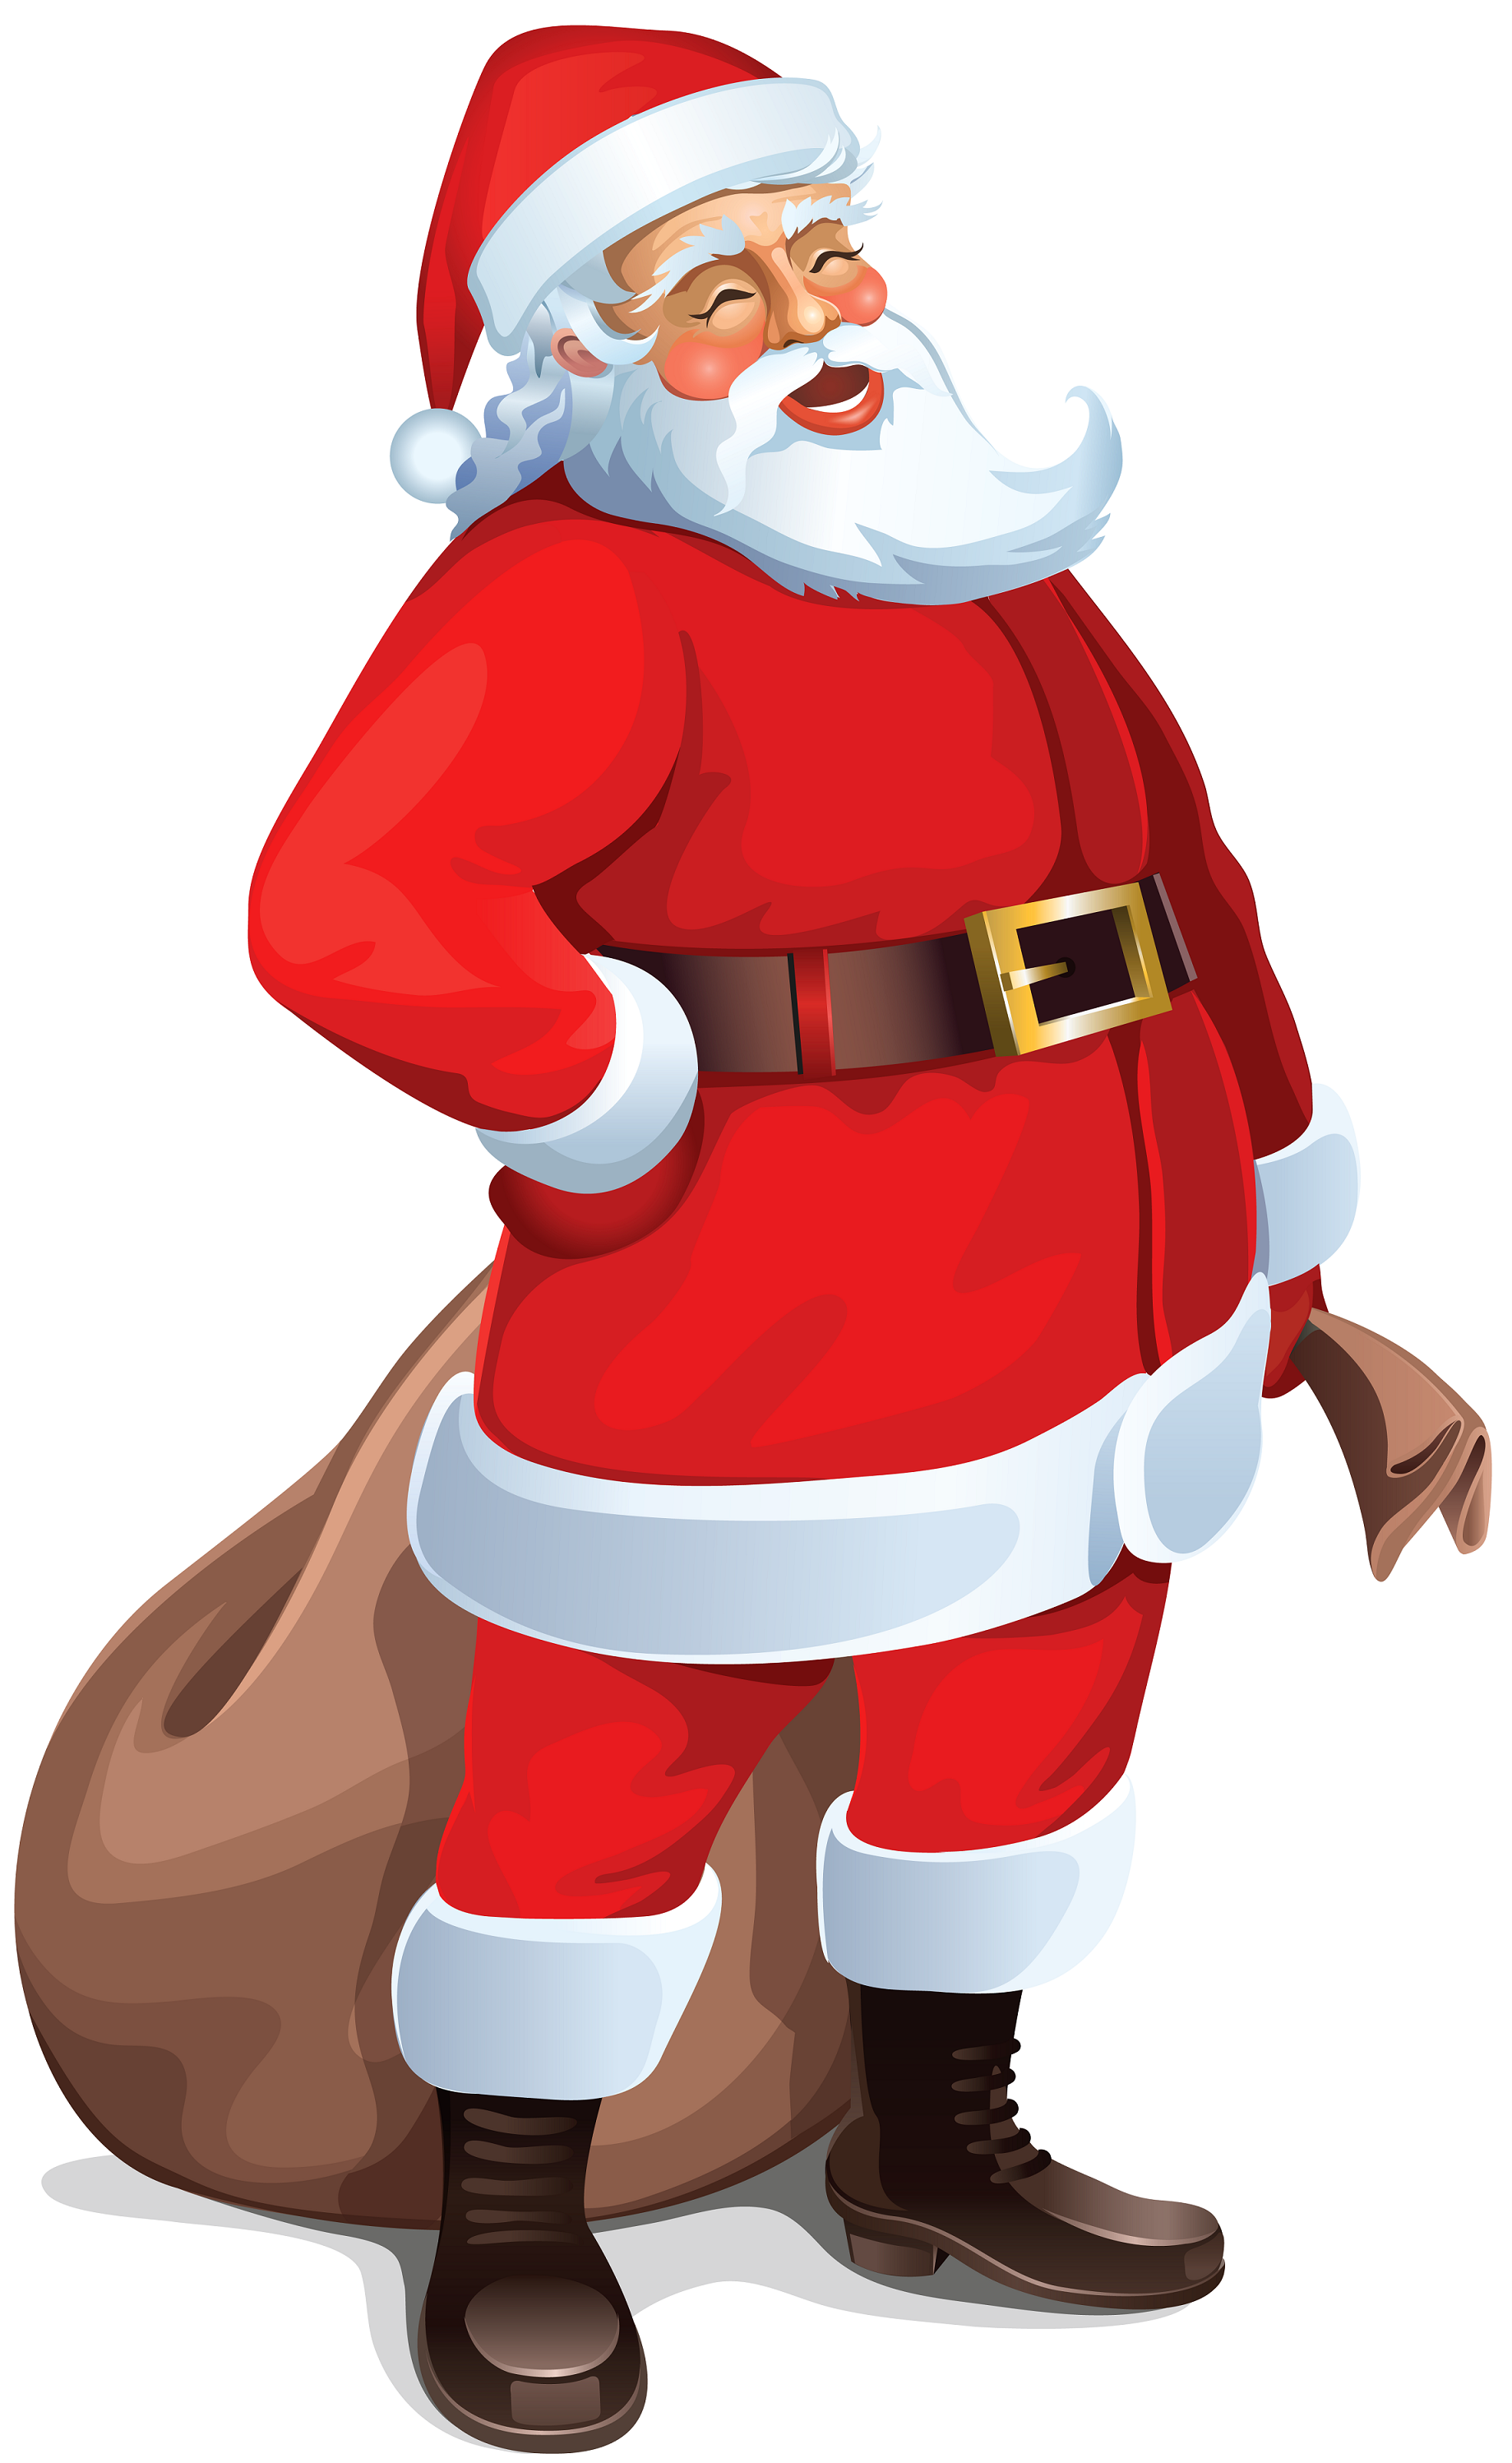 Santa Claus clip art   Clip Art Holiday Scrapbook, Cards, Images etc ...